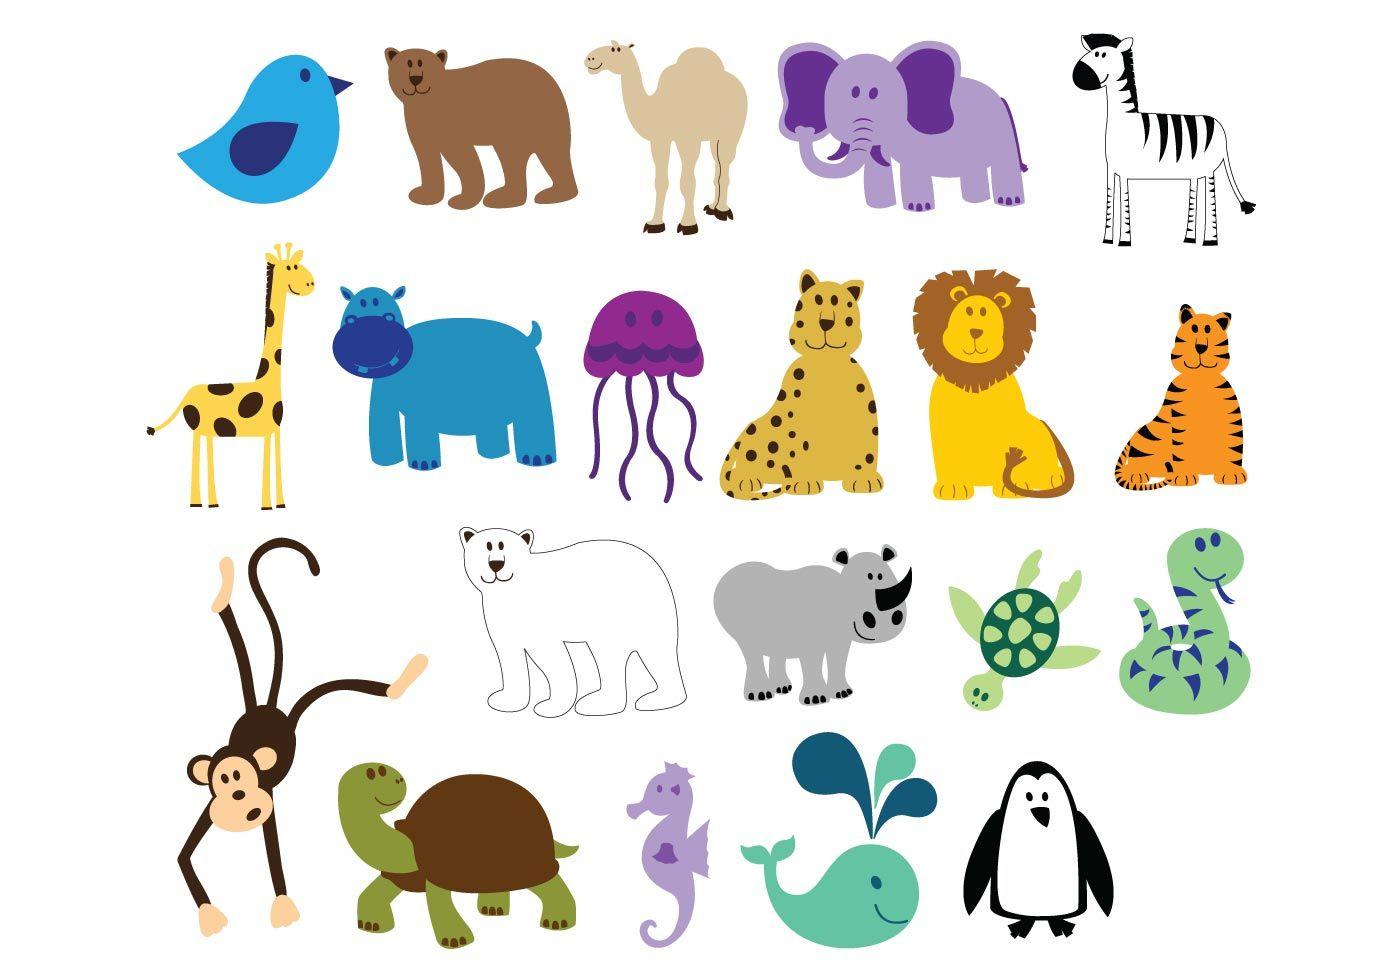 Free Colorful Animals Cute Animal Clipart Cartoon Zoo Animals Animal Clipart